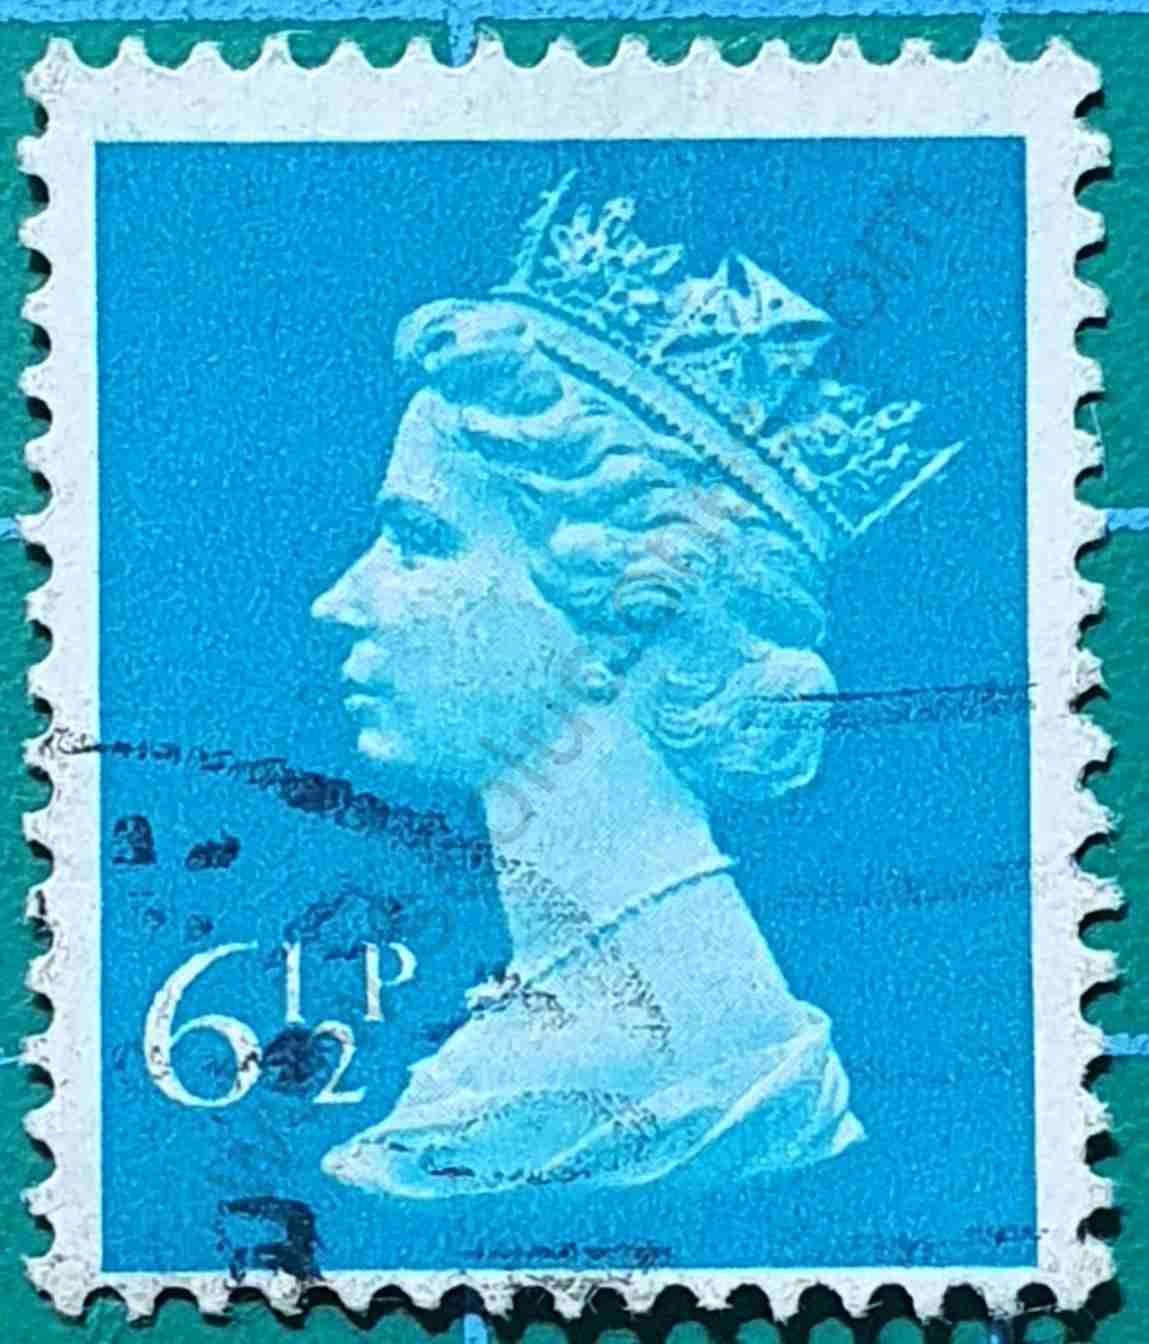 Sello Isabel II - 1975 Reino Unido